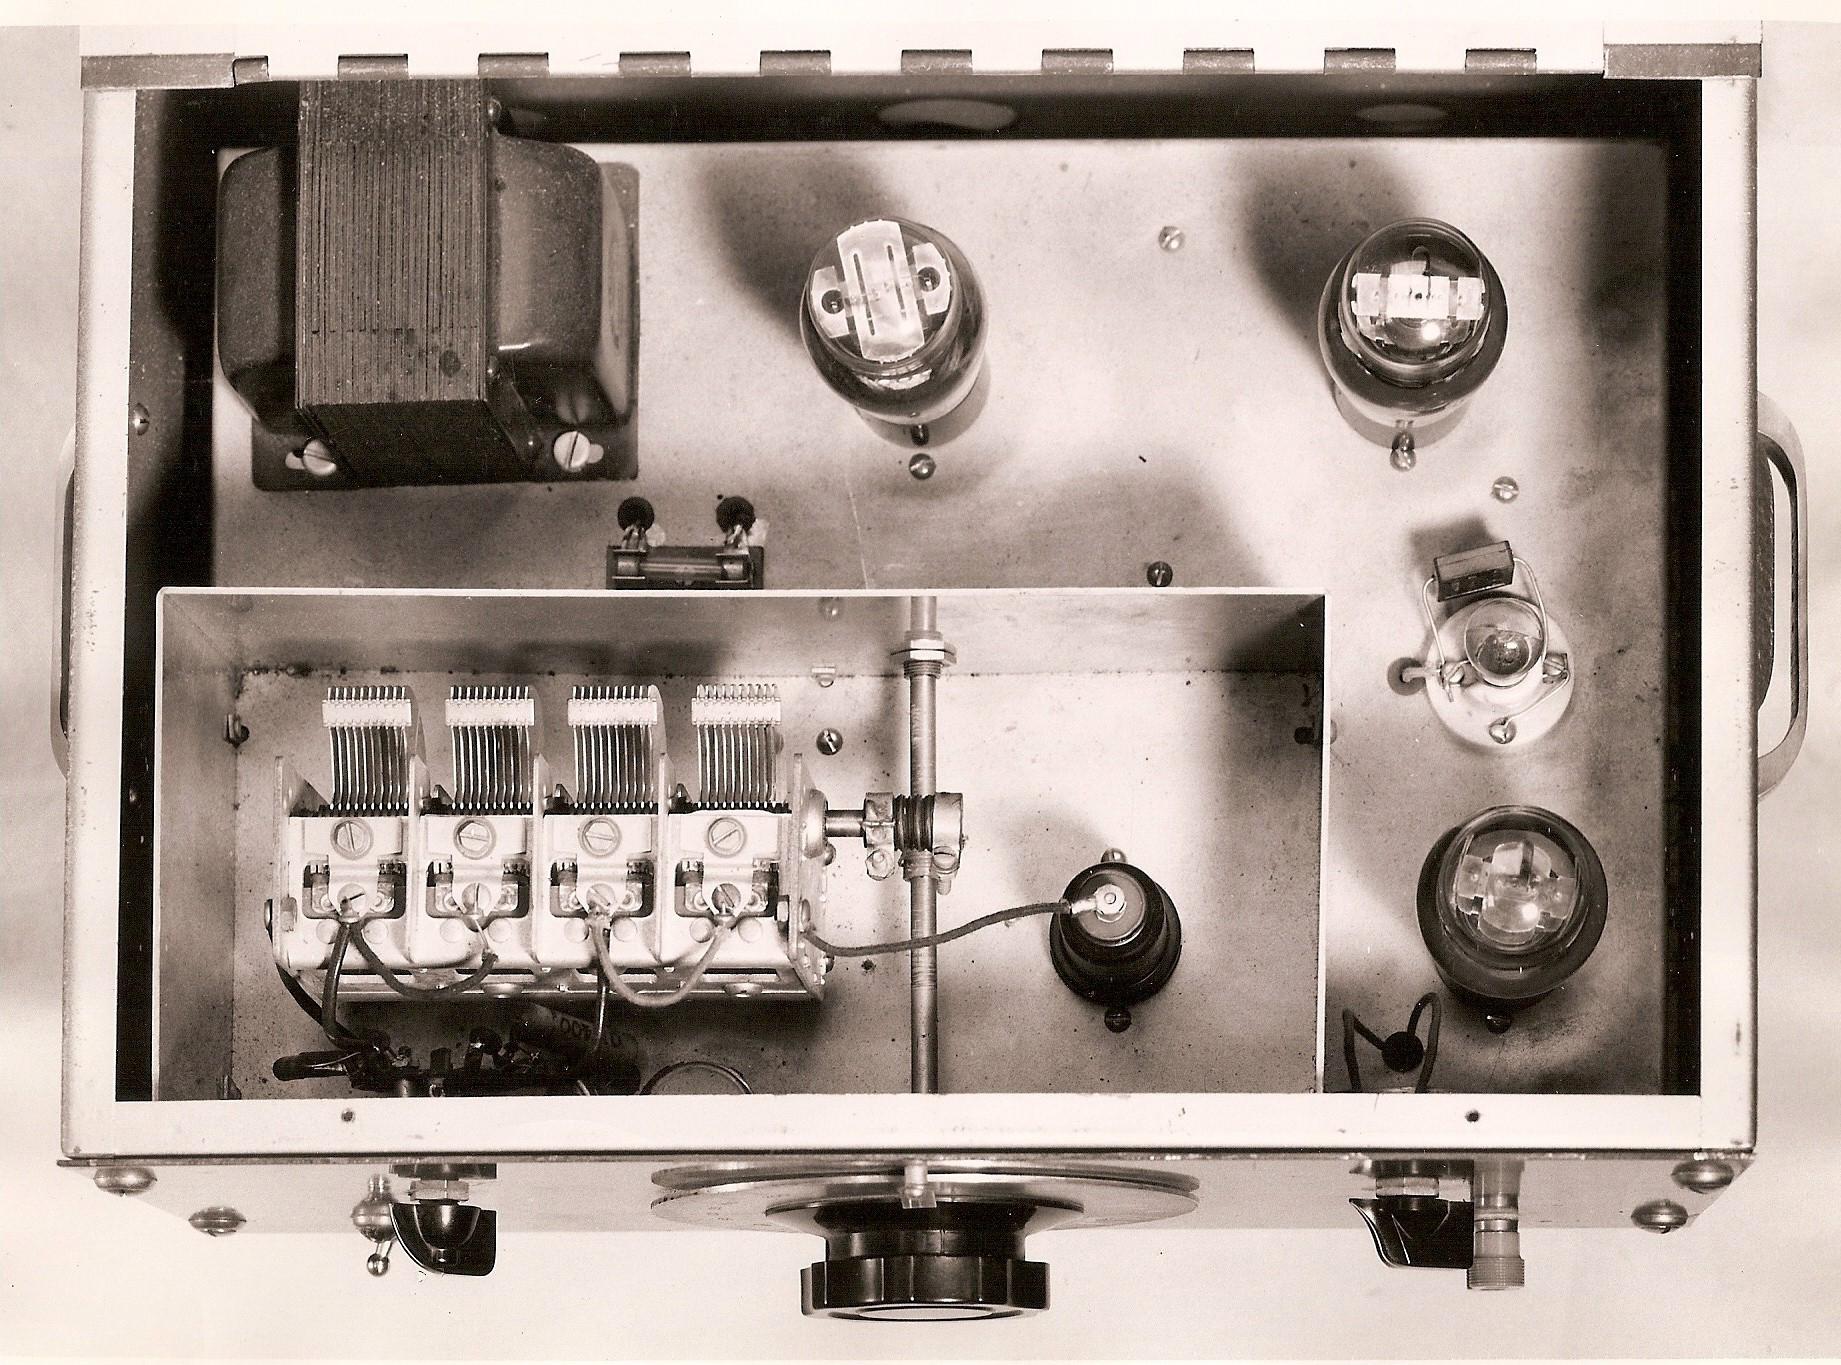 200 Audio Oscillator Exhibit Keysight Historical Archives Low Distortion Range Prototype From 1938 Internal View